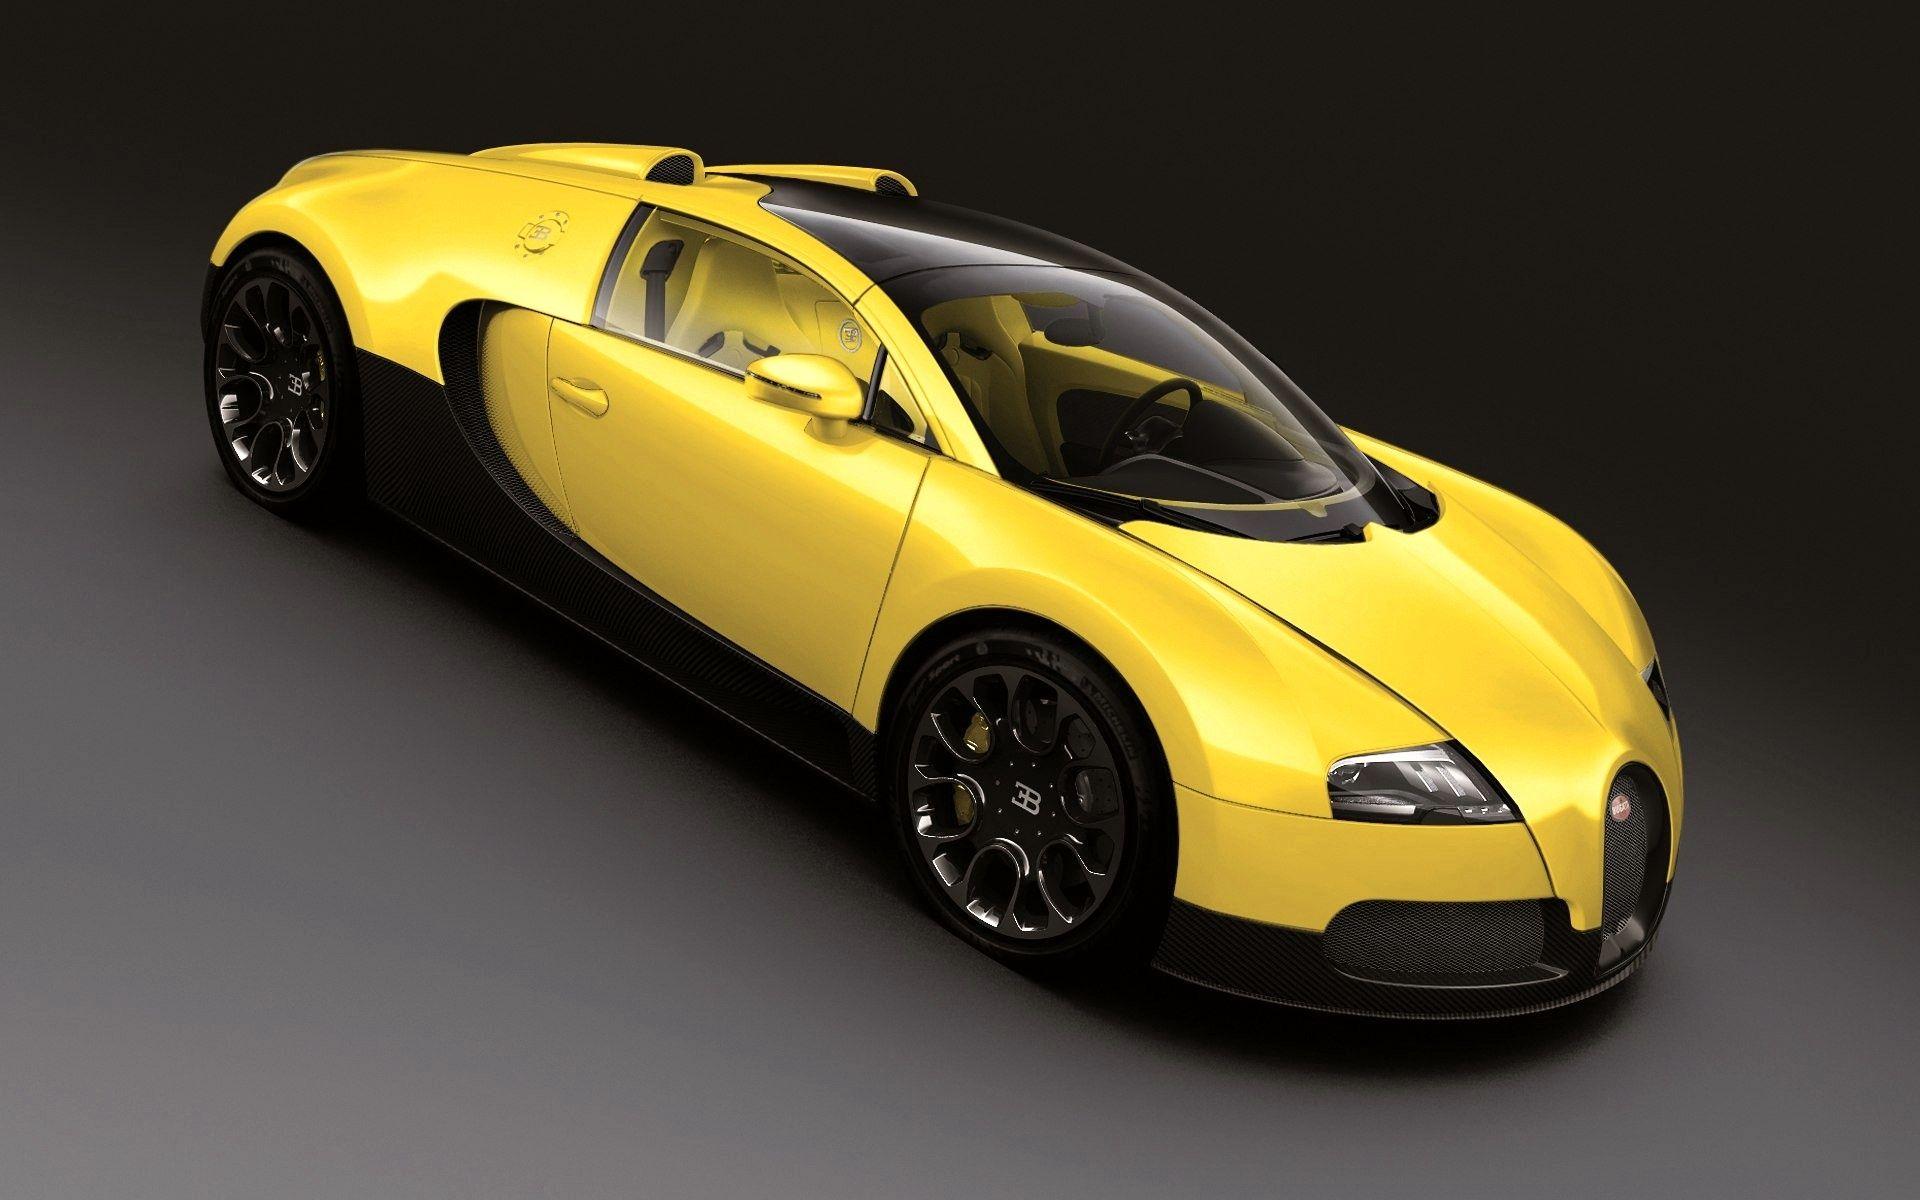 fe7264c3830eb65241e4c916f8ee683d Astounding Bugatti Veyron Grand Sport Vitesse Hd Cars Trend